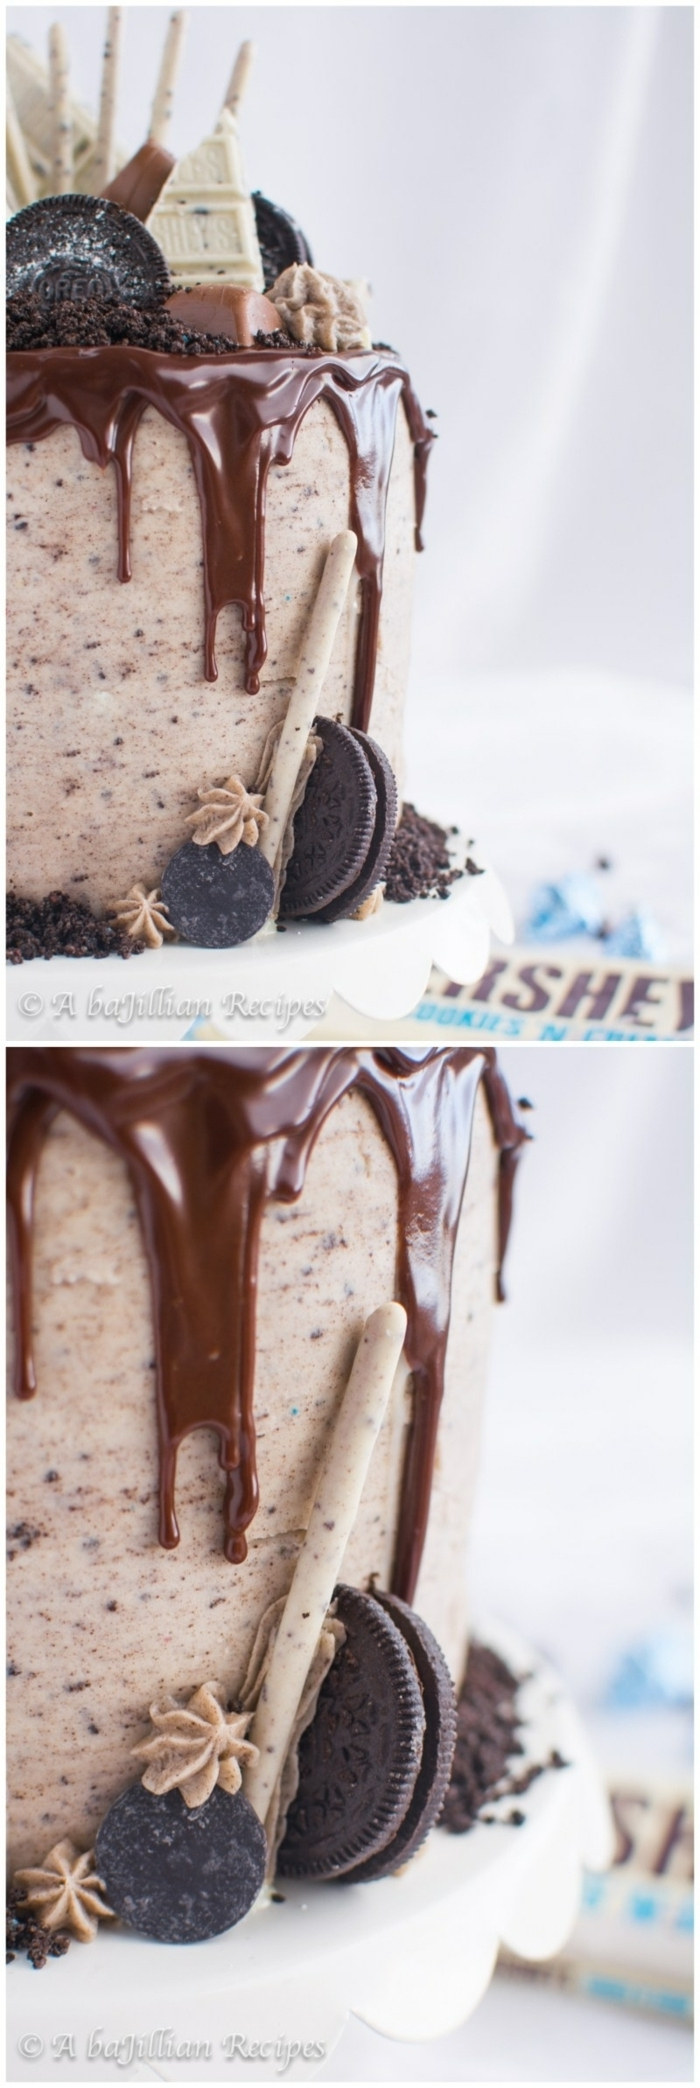 Oreo Rezept, Torte mit Schokoladenglasur, weiße Schokolade als Dekoration, halber Oreo Keks